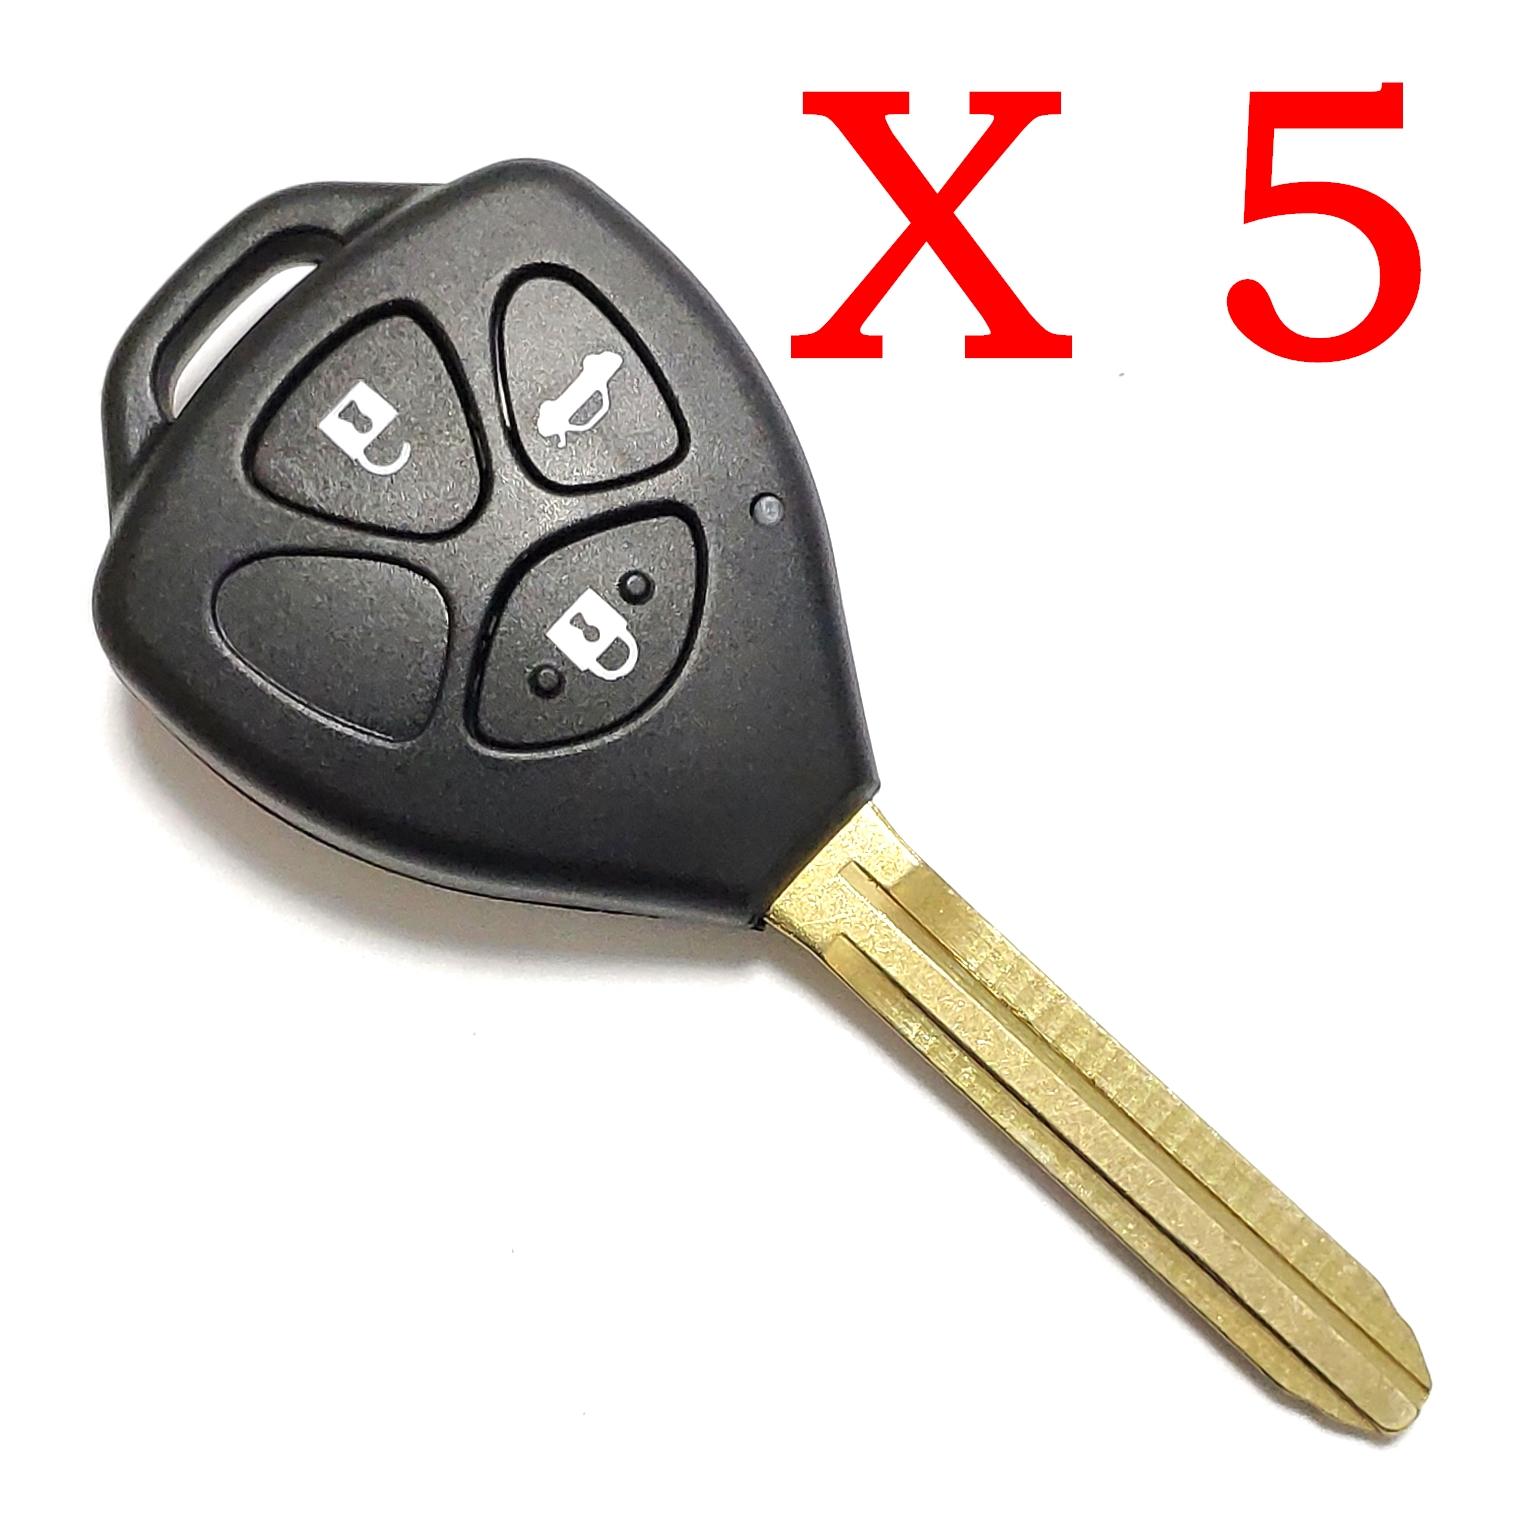 5 Pieces of Xhorse VVDI Toyota Type Universal Remote Control - XKTO03EN